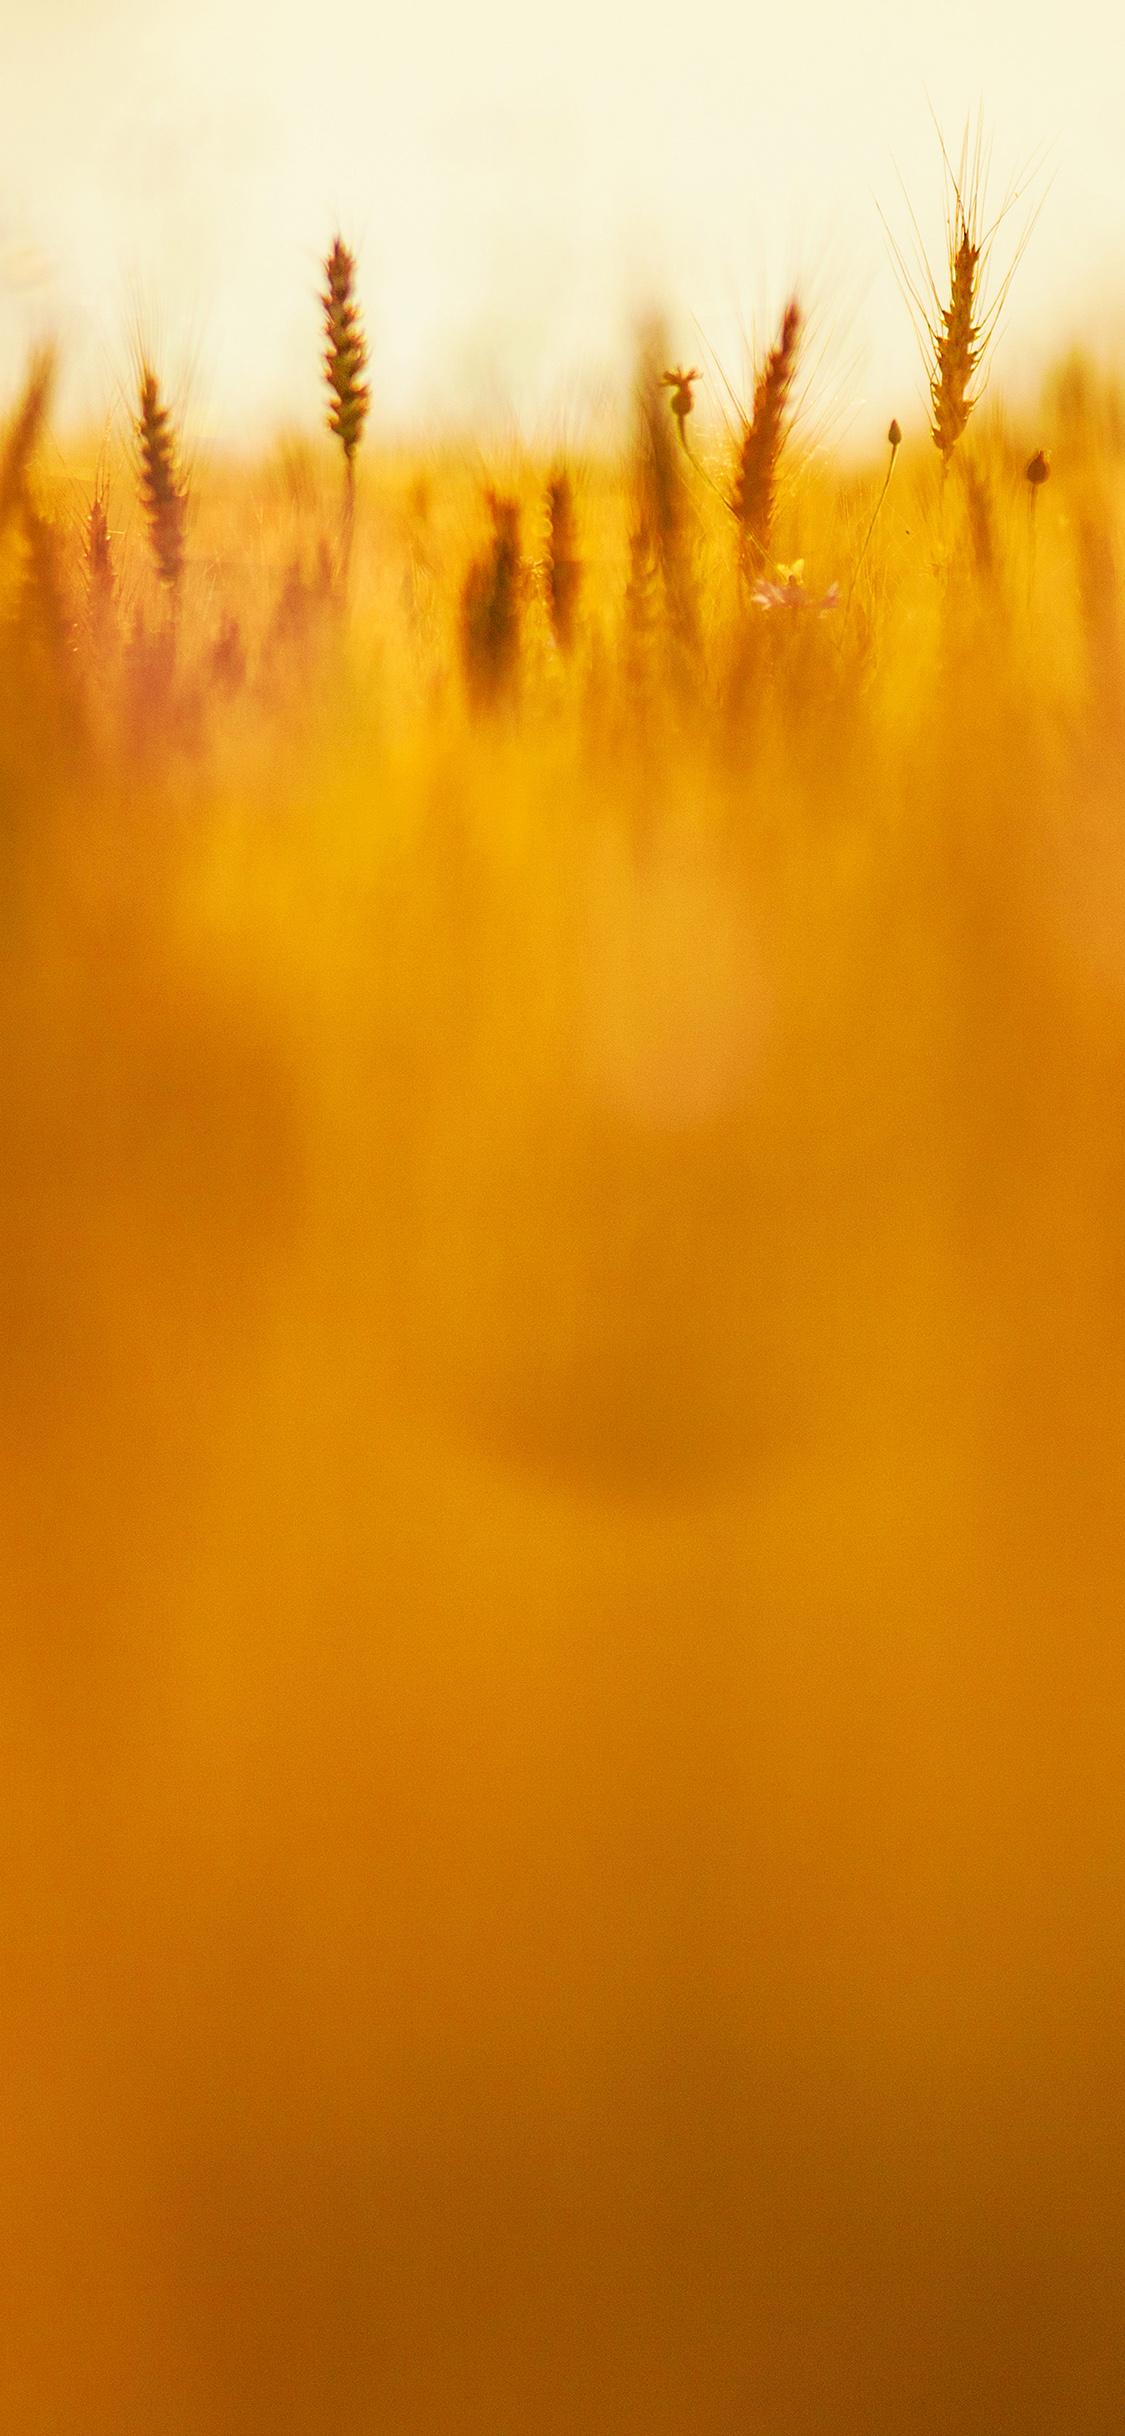 iPhoneXpapers.com-Apple-iPhone-wallpaper-vj89-grass-field-nature-orange-red-pattern